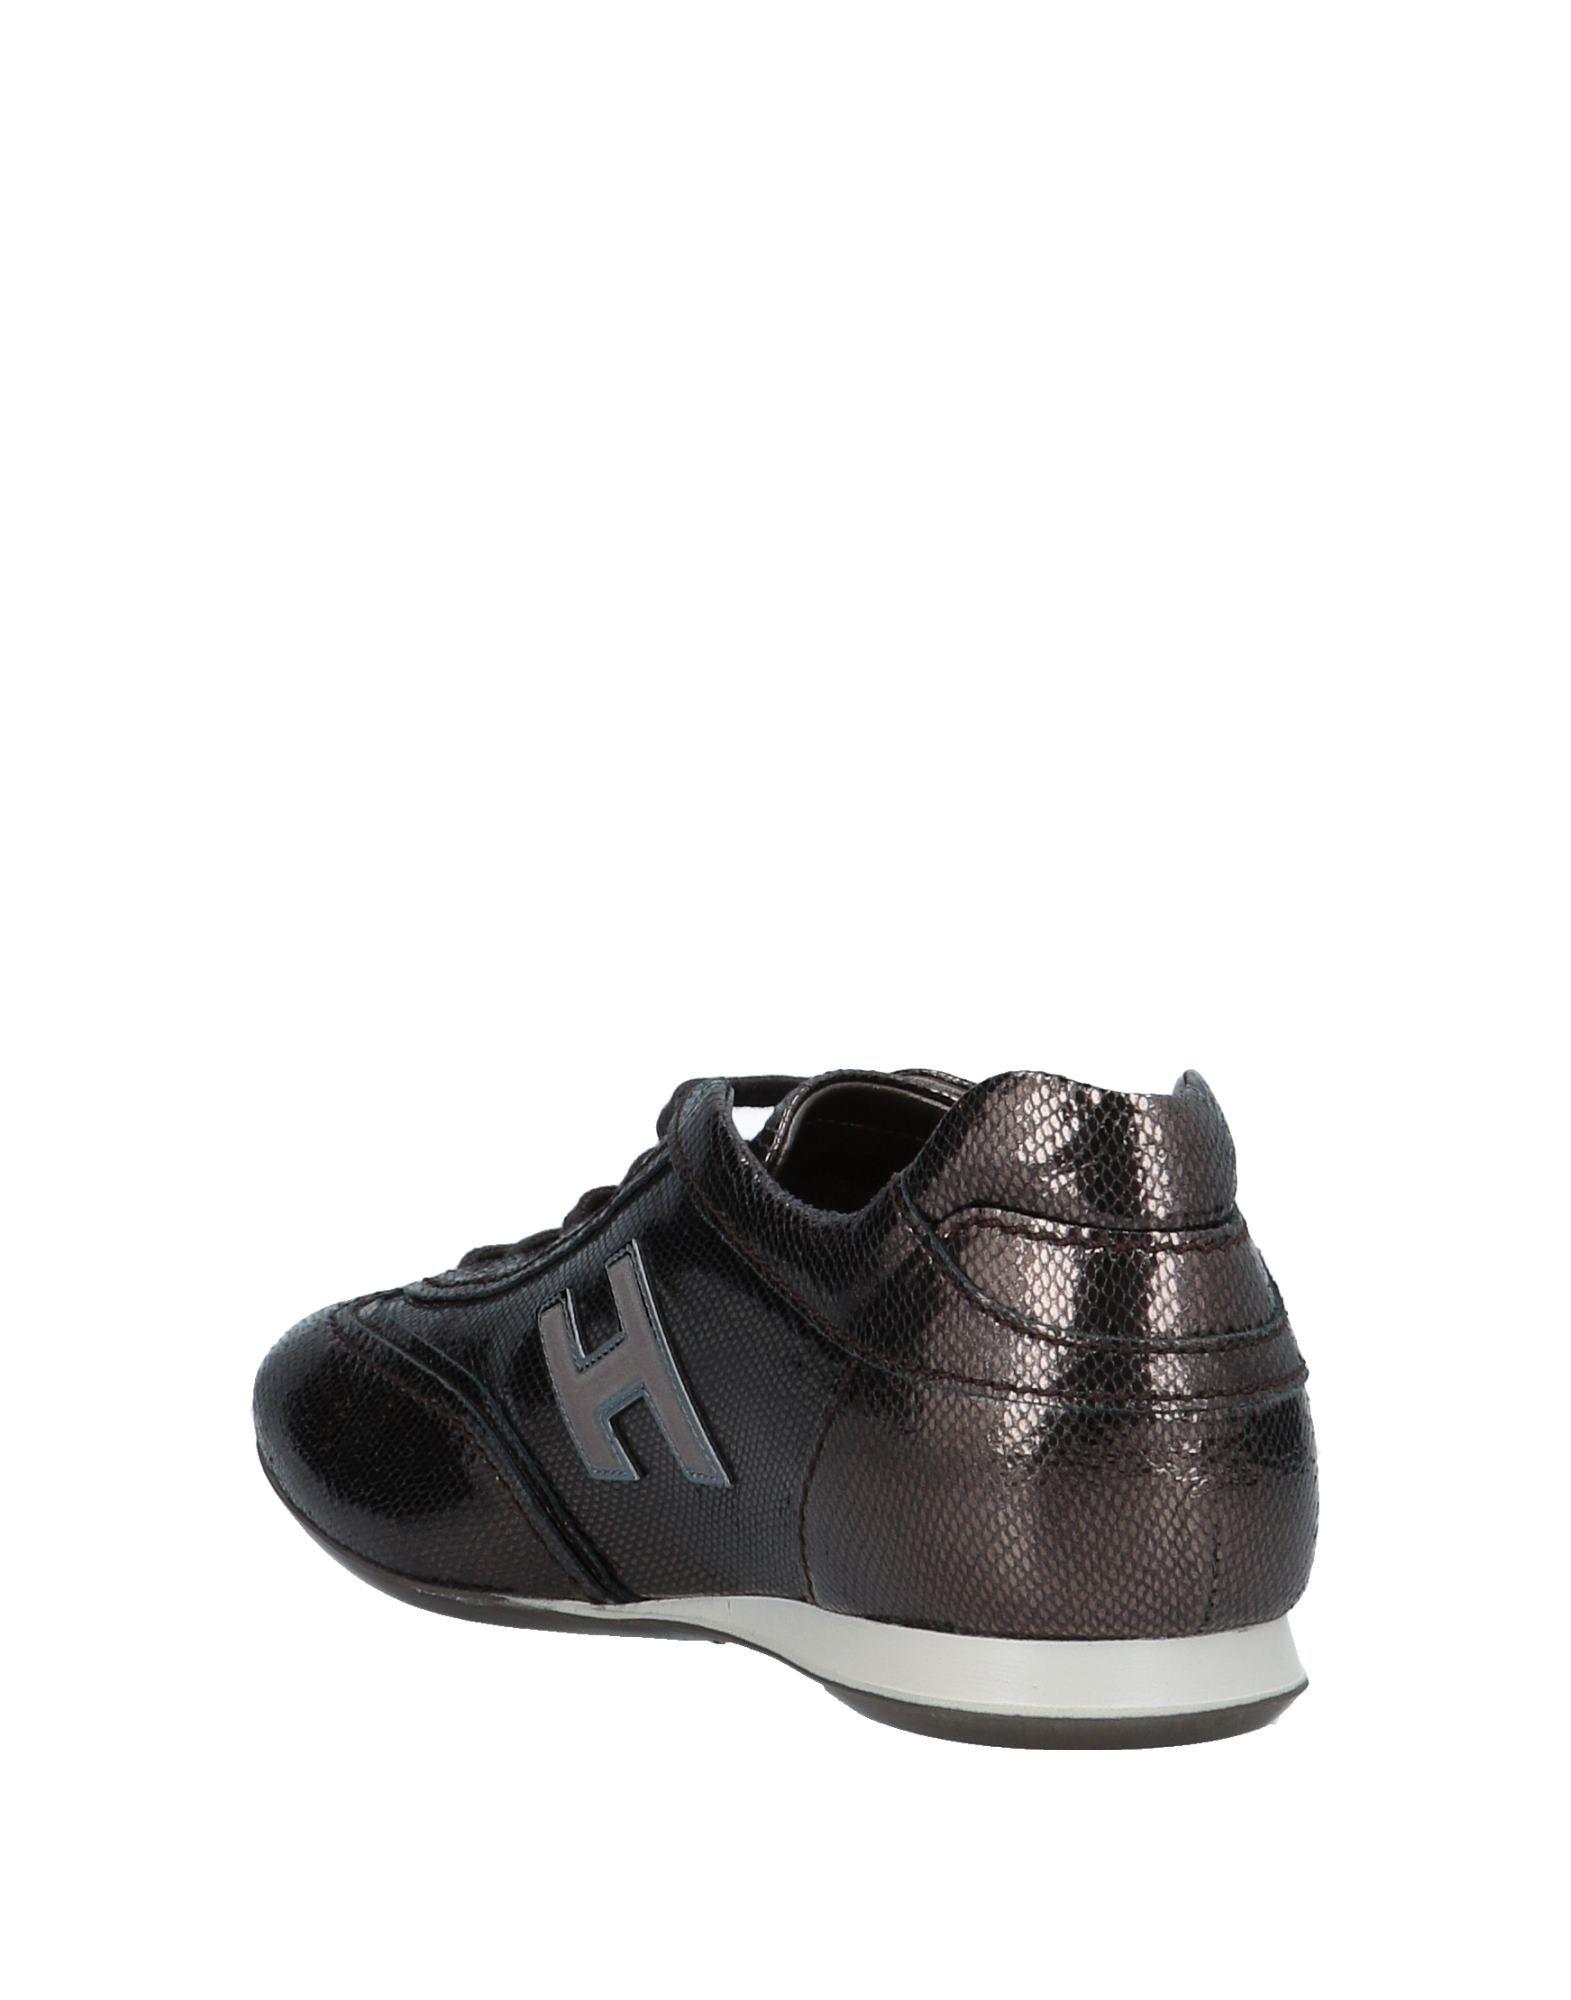 Rabatt  Schuhe Hogan Sneakers Damen  Rabatt 11567634DW 0d8055